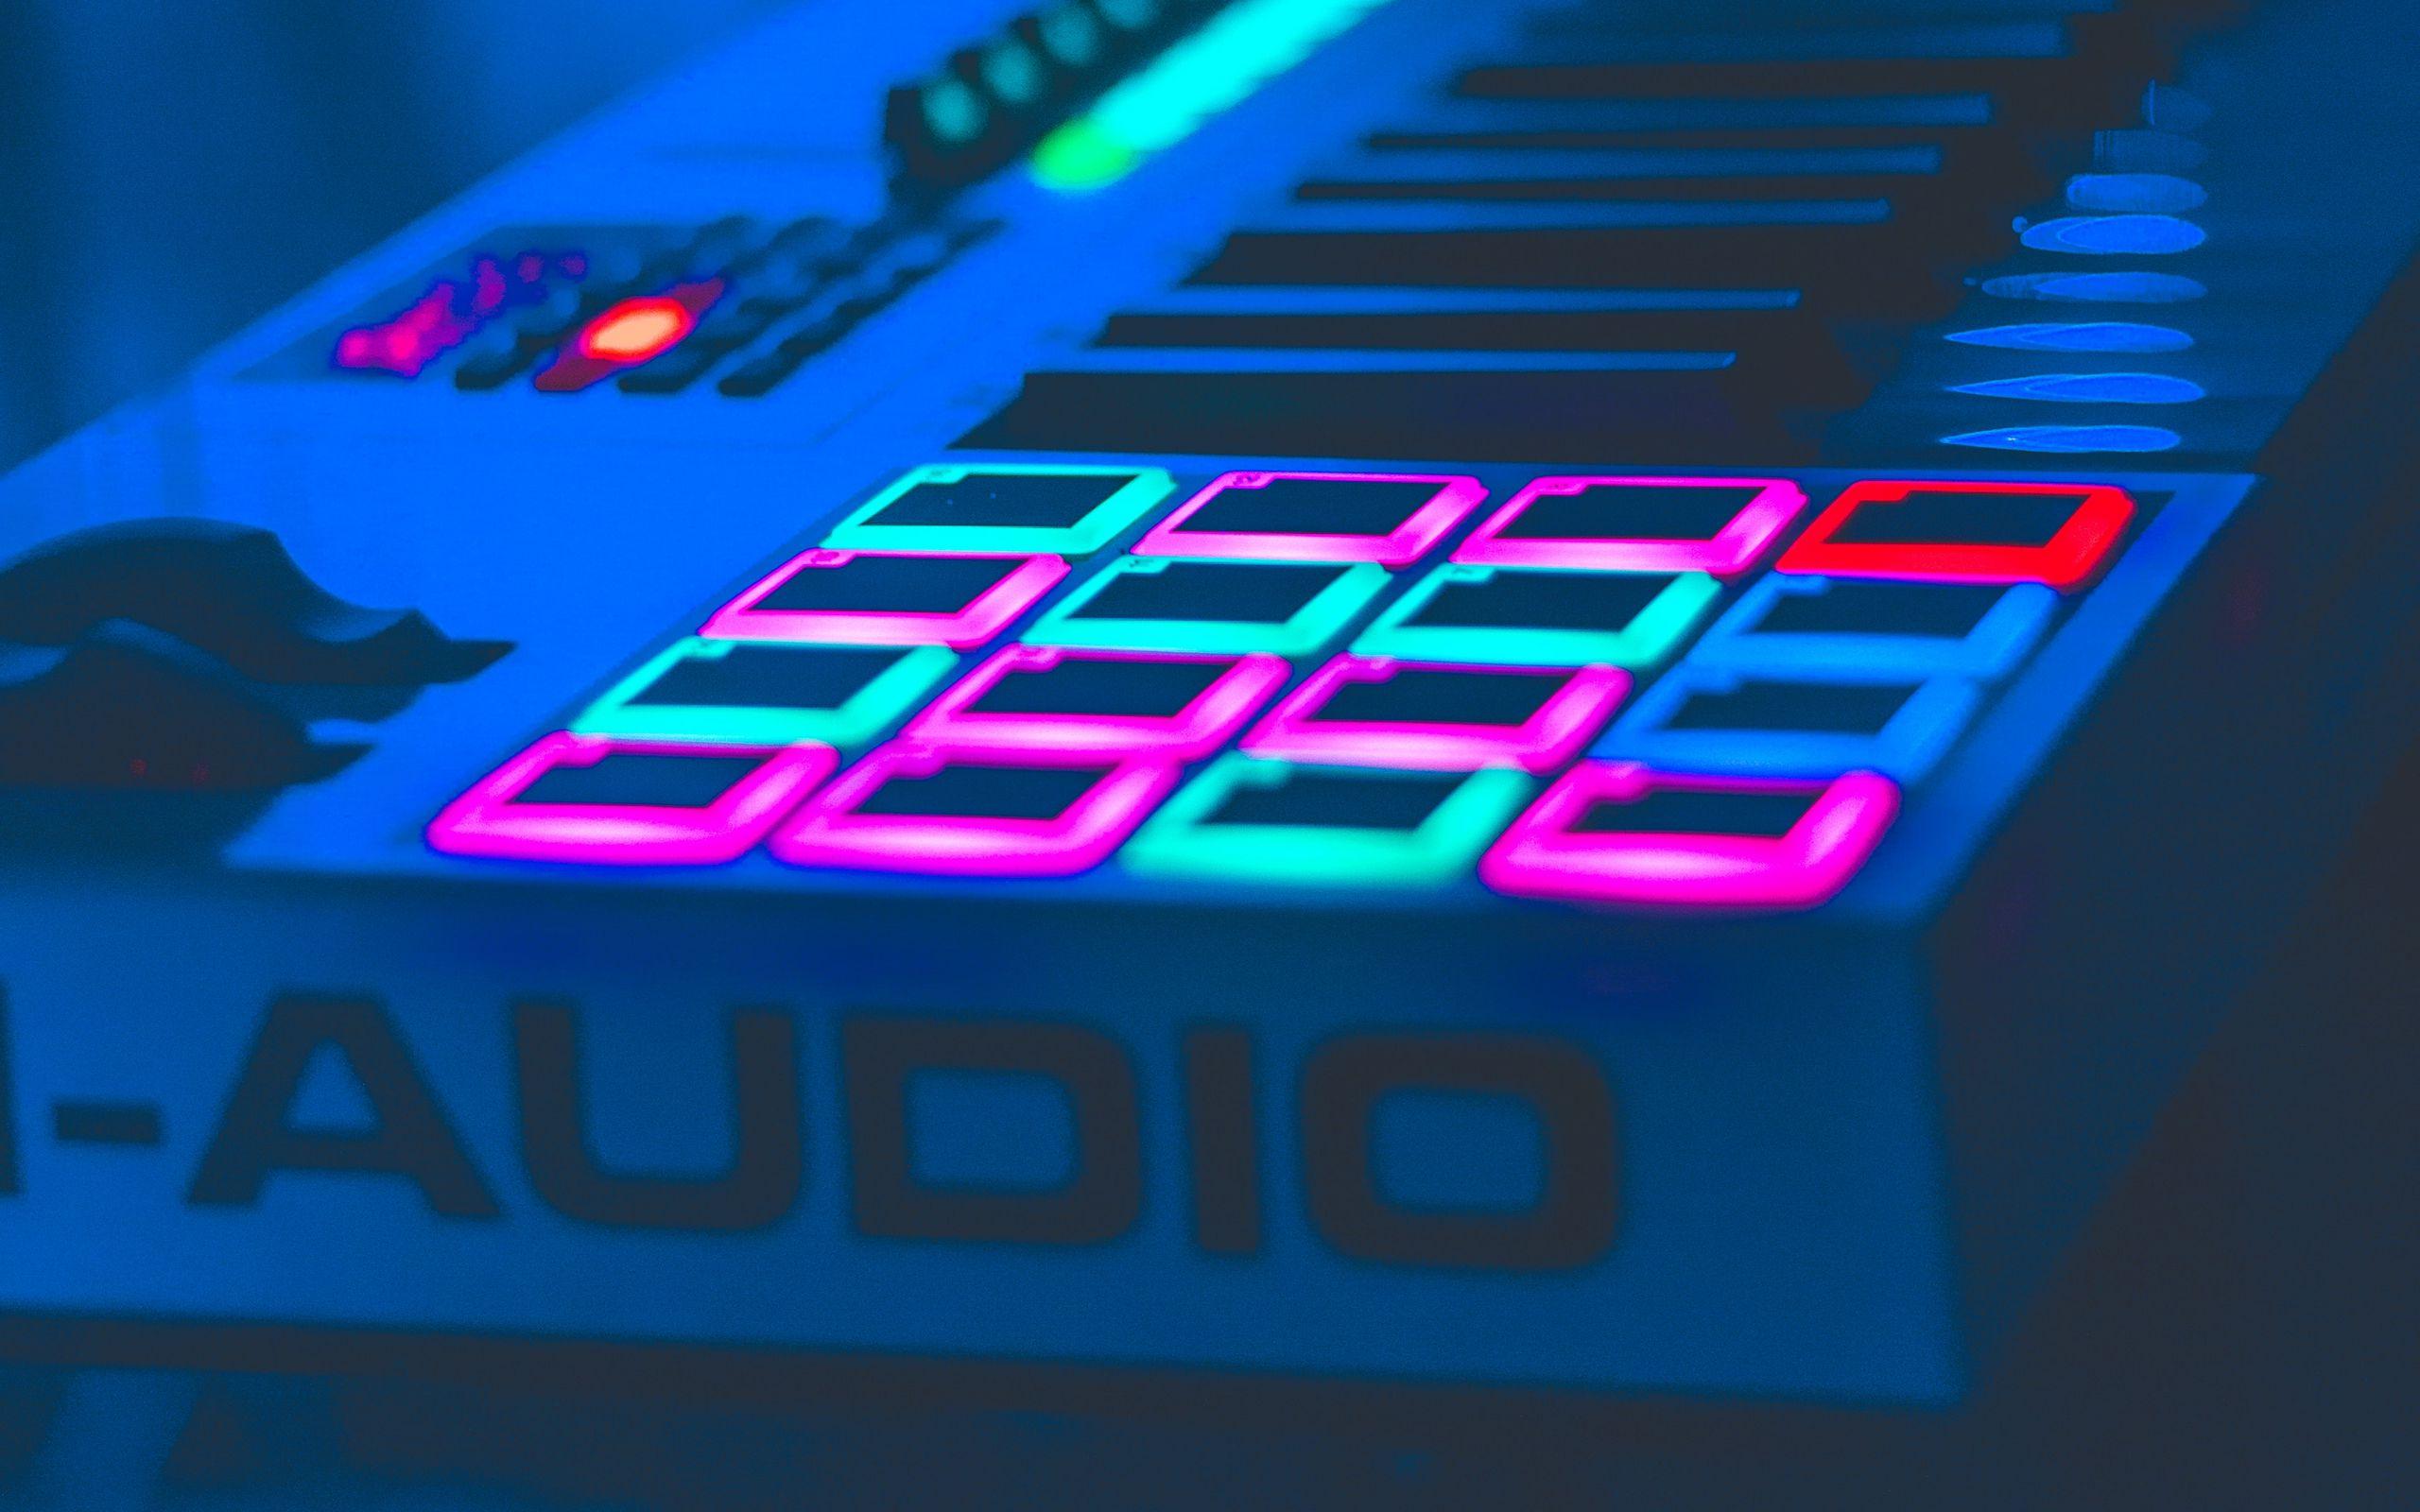 2560x1600 Wallpaper neon, key, instrumental, audio